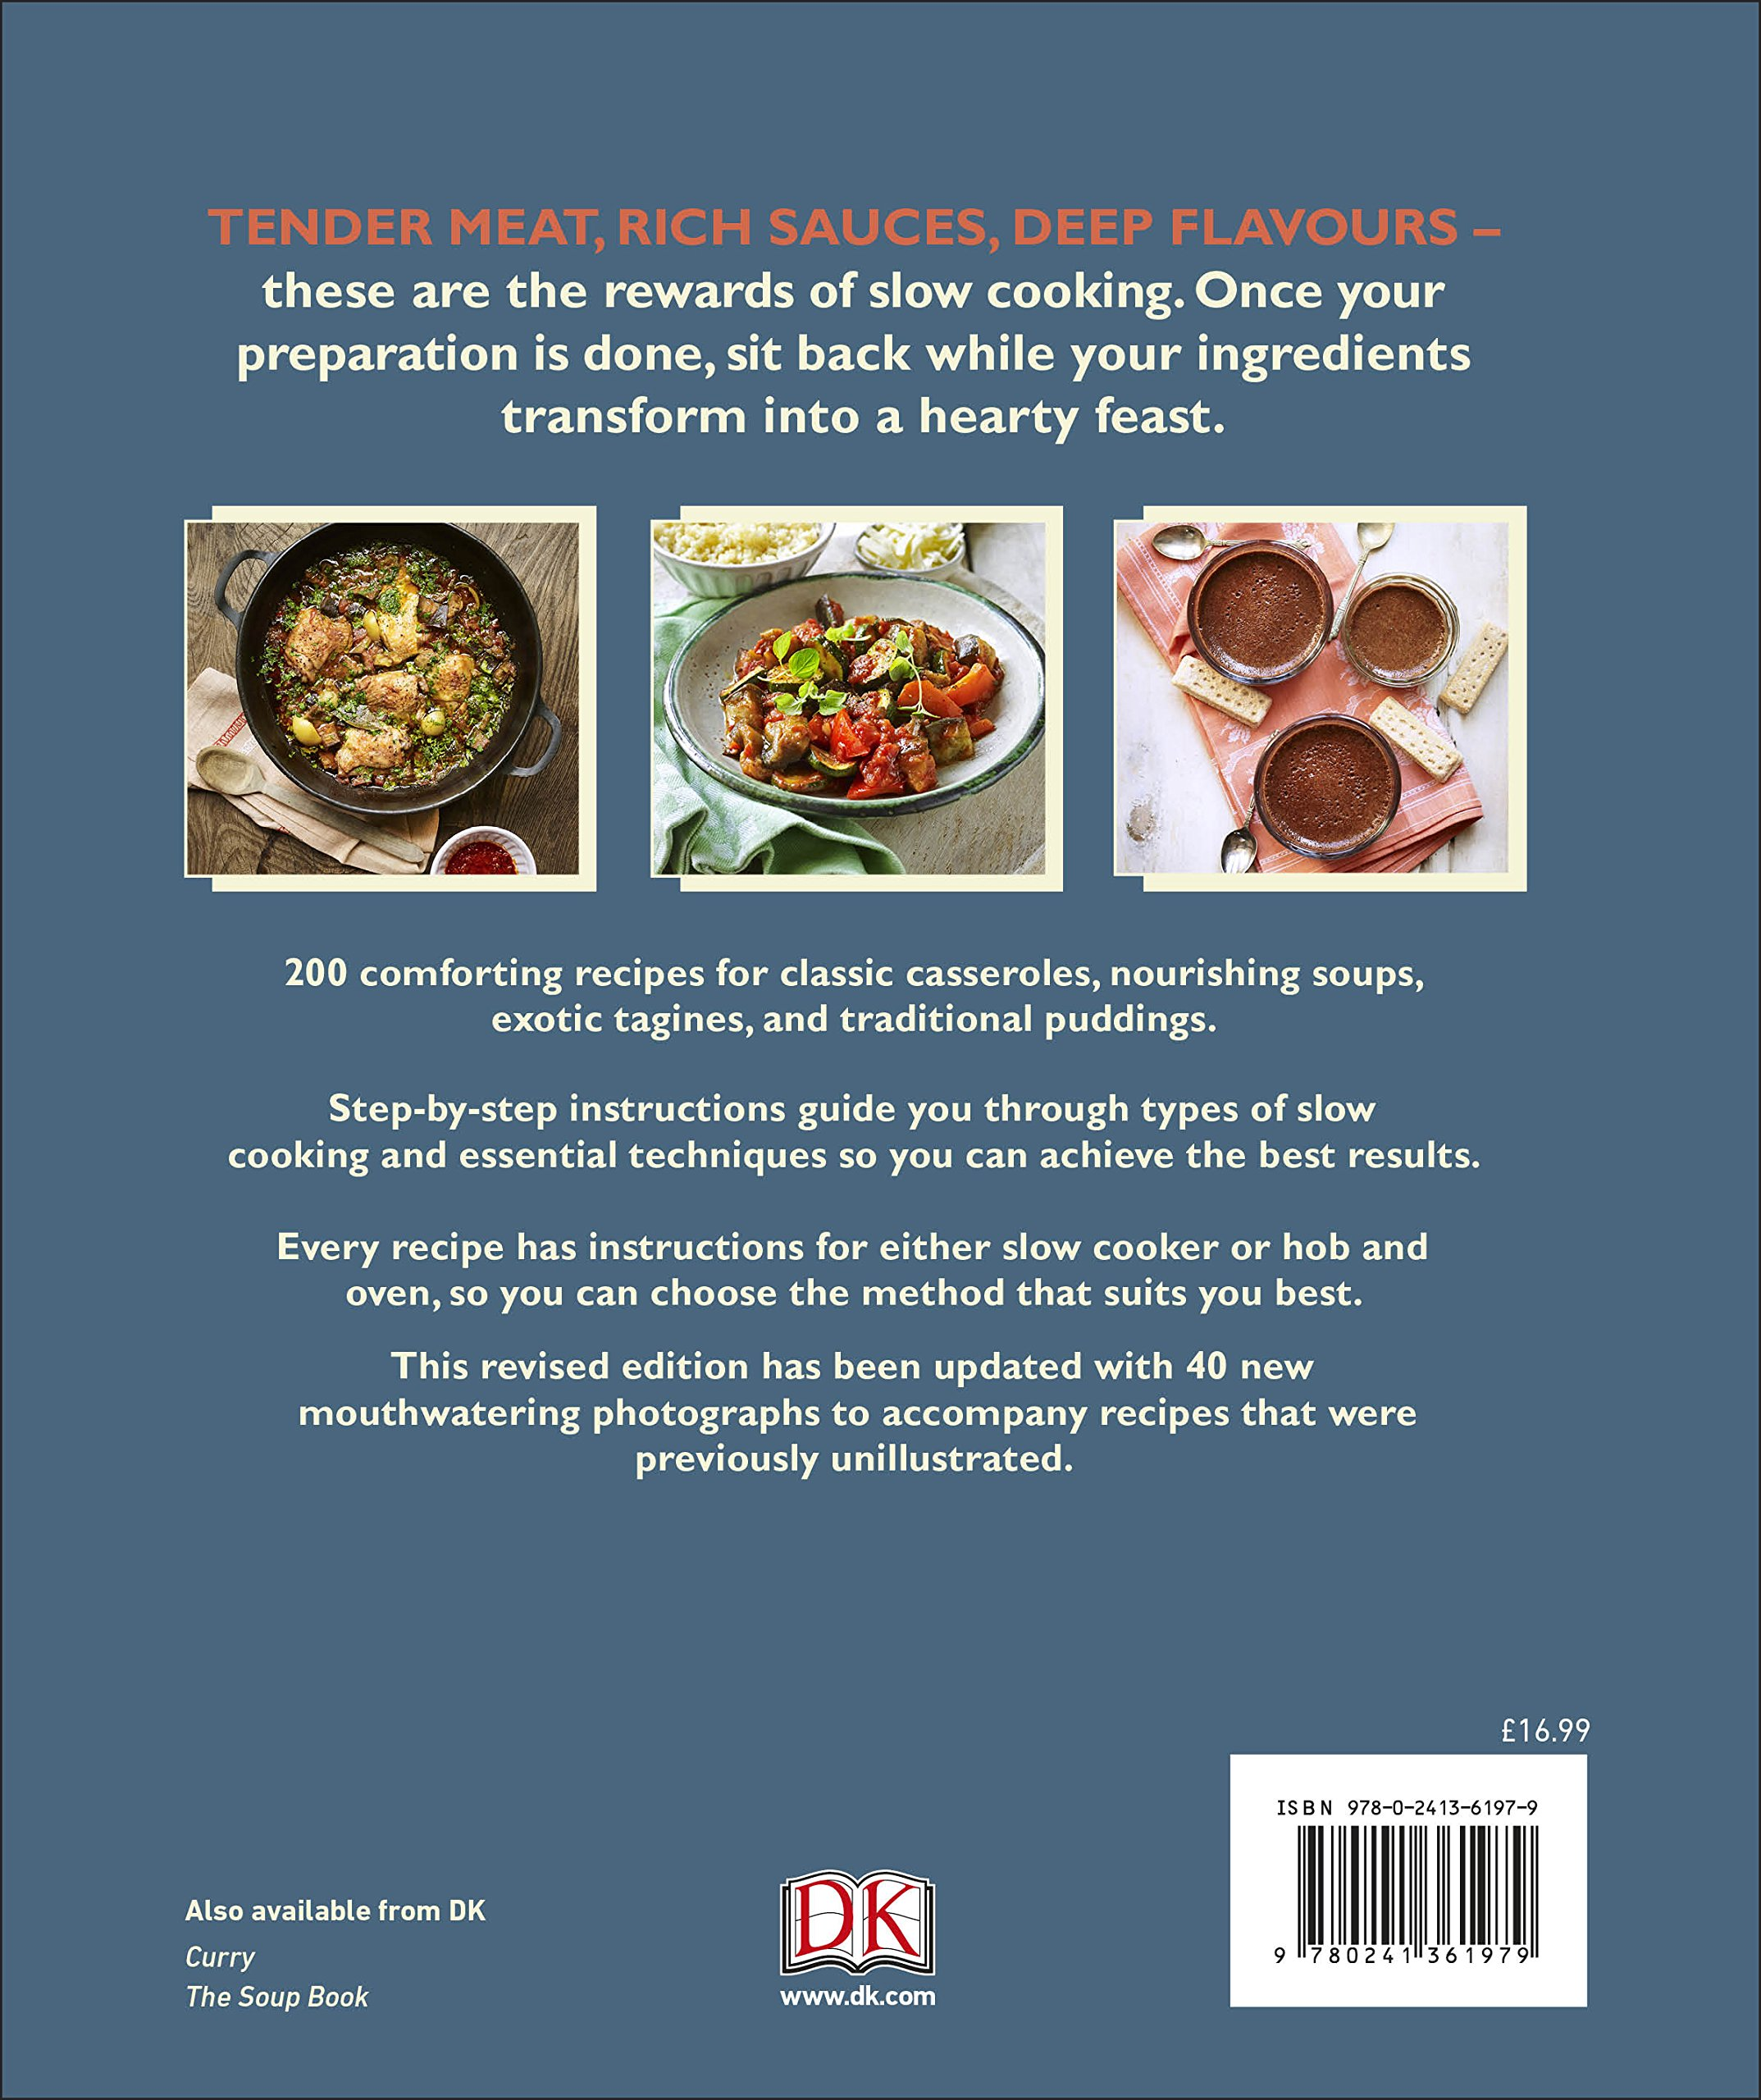 23 neue Slow-Cooker Rezepte (German Edition)